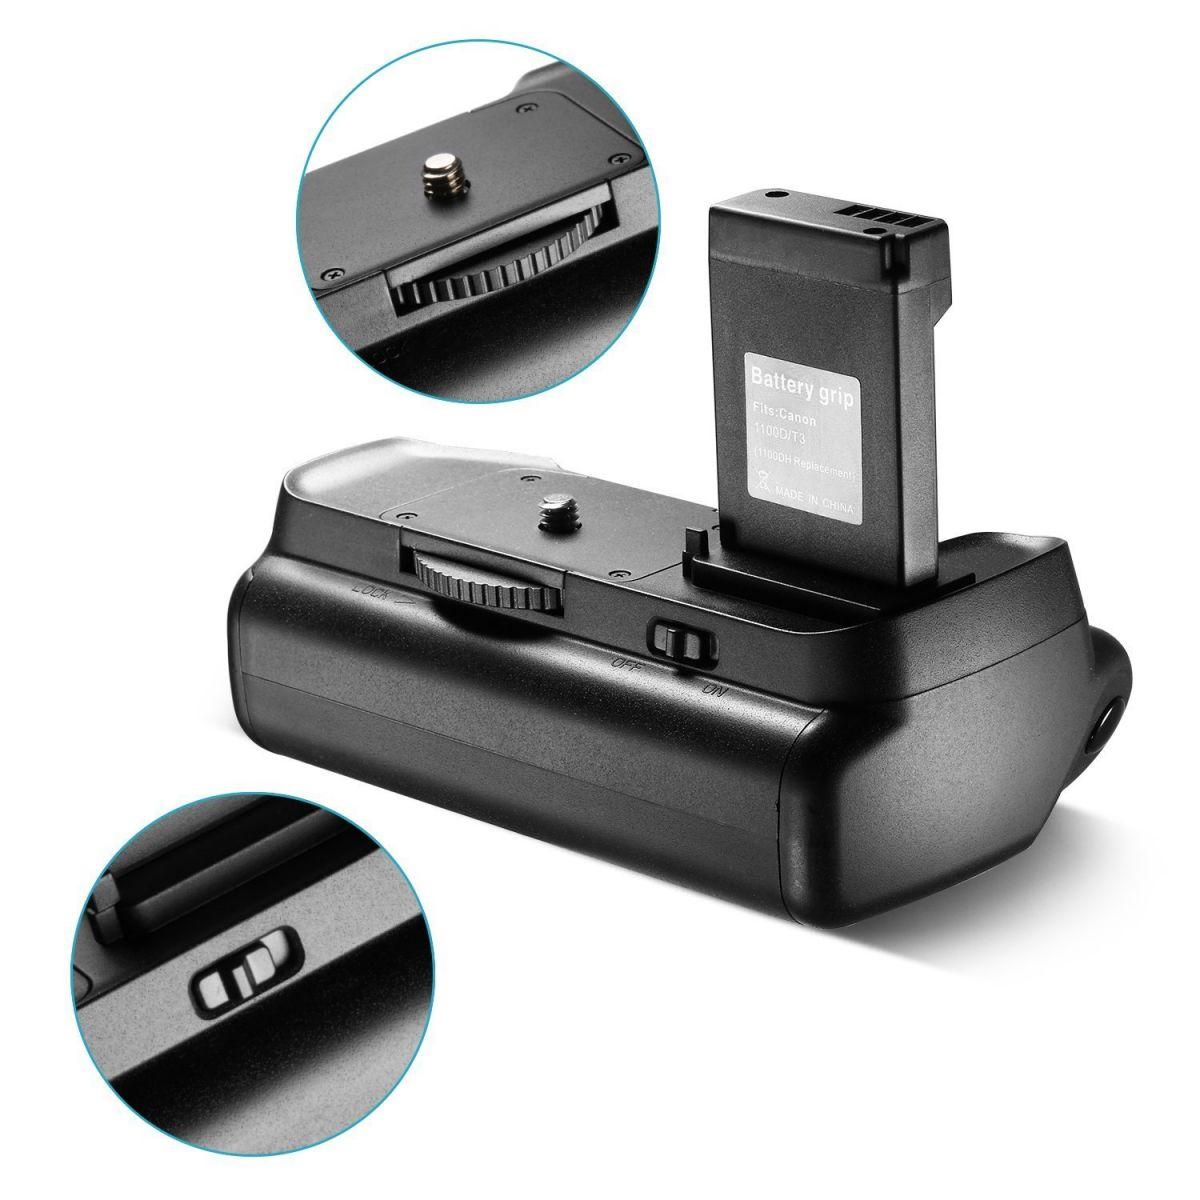 Kit Battery Grip 1100DH + 2 baterias LP-E10 + Carregador para Canon EOS Rebel T3 T5